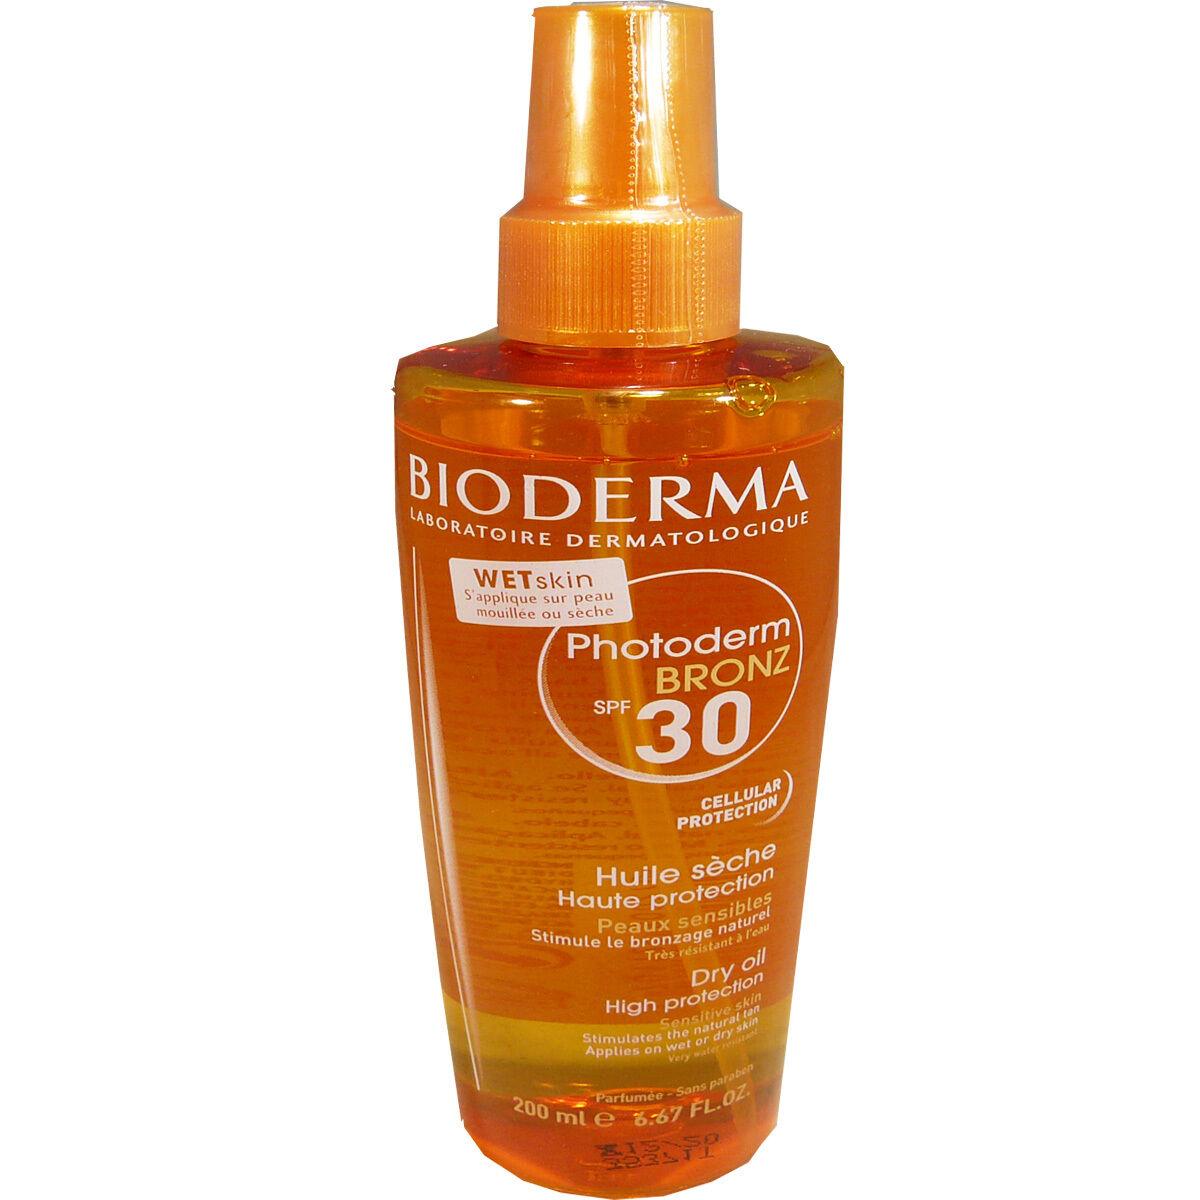 Bioderma photoderm spf 30 huile seche 200 ml